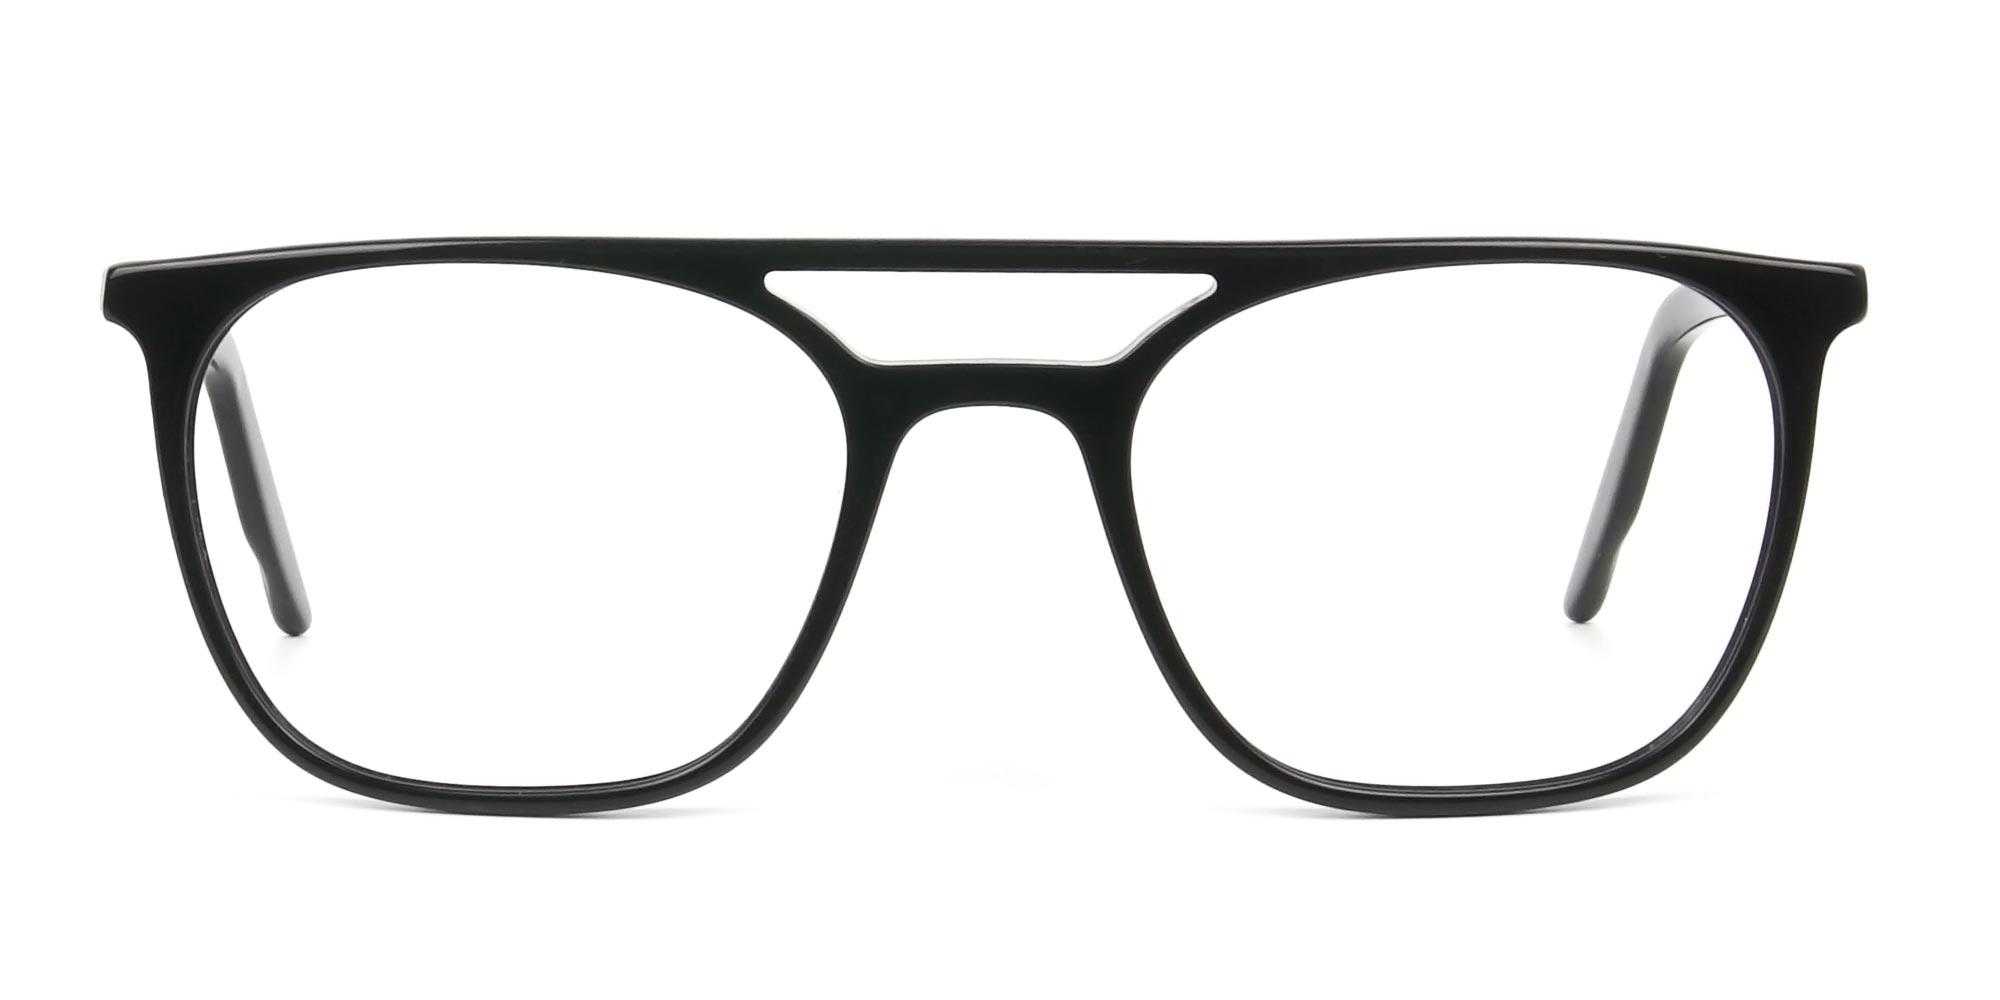 Professor Glasses